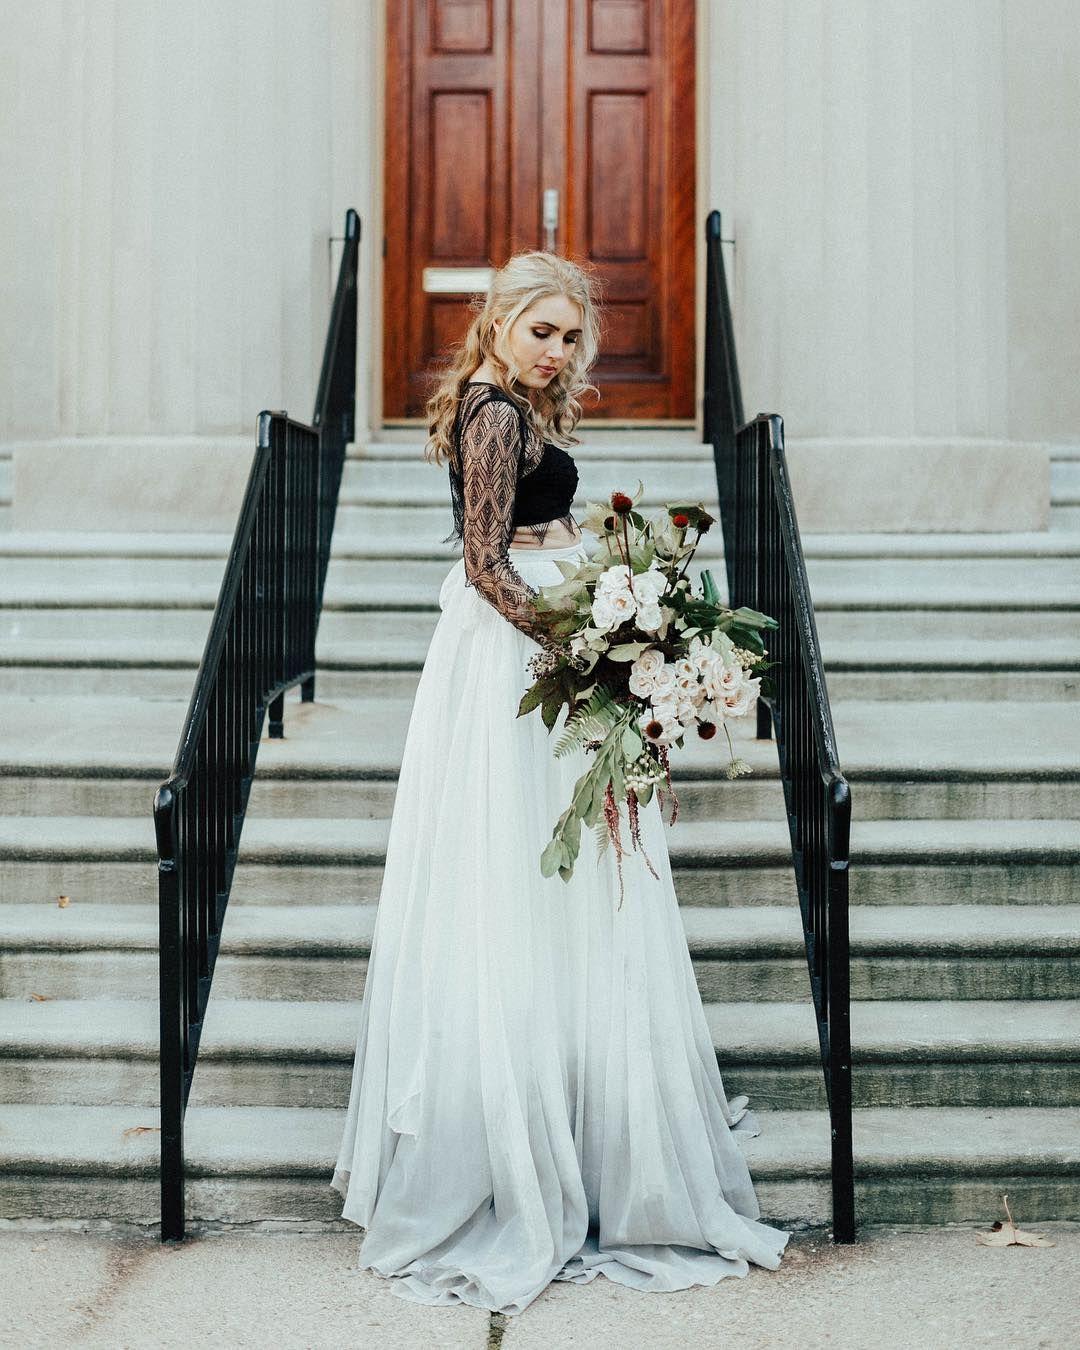 Pin By Mad On Wedding Dip Dye Wedding Dress Wedding Dresses Dye Wedding Dress [ 1350 x 1080 Pixel ]